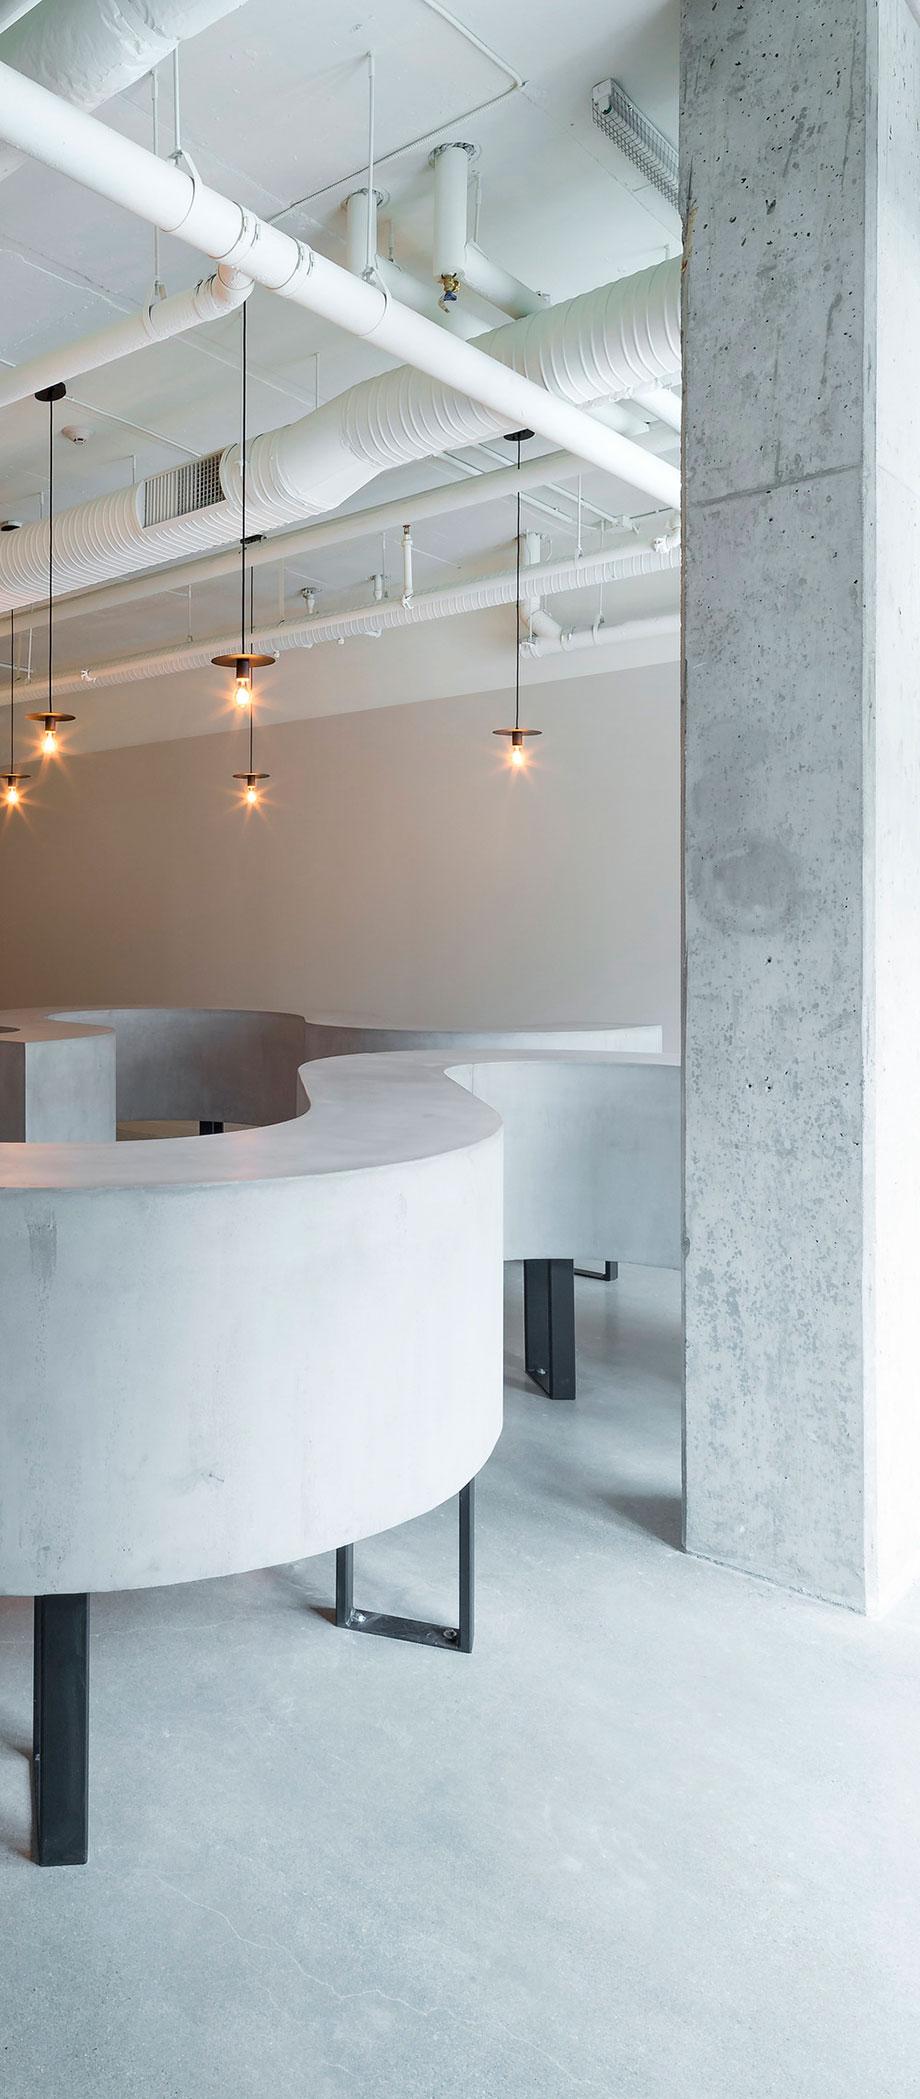 shuck shuck de batay-csorba architects (4) - foto silentsama